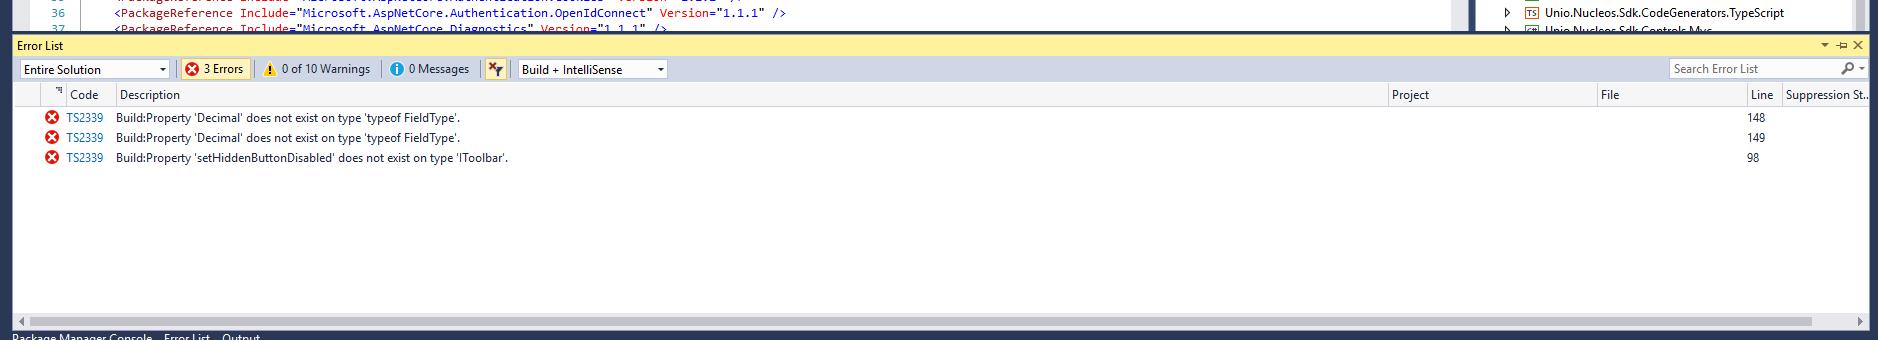 Error List